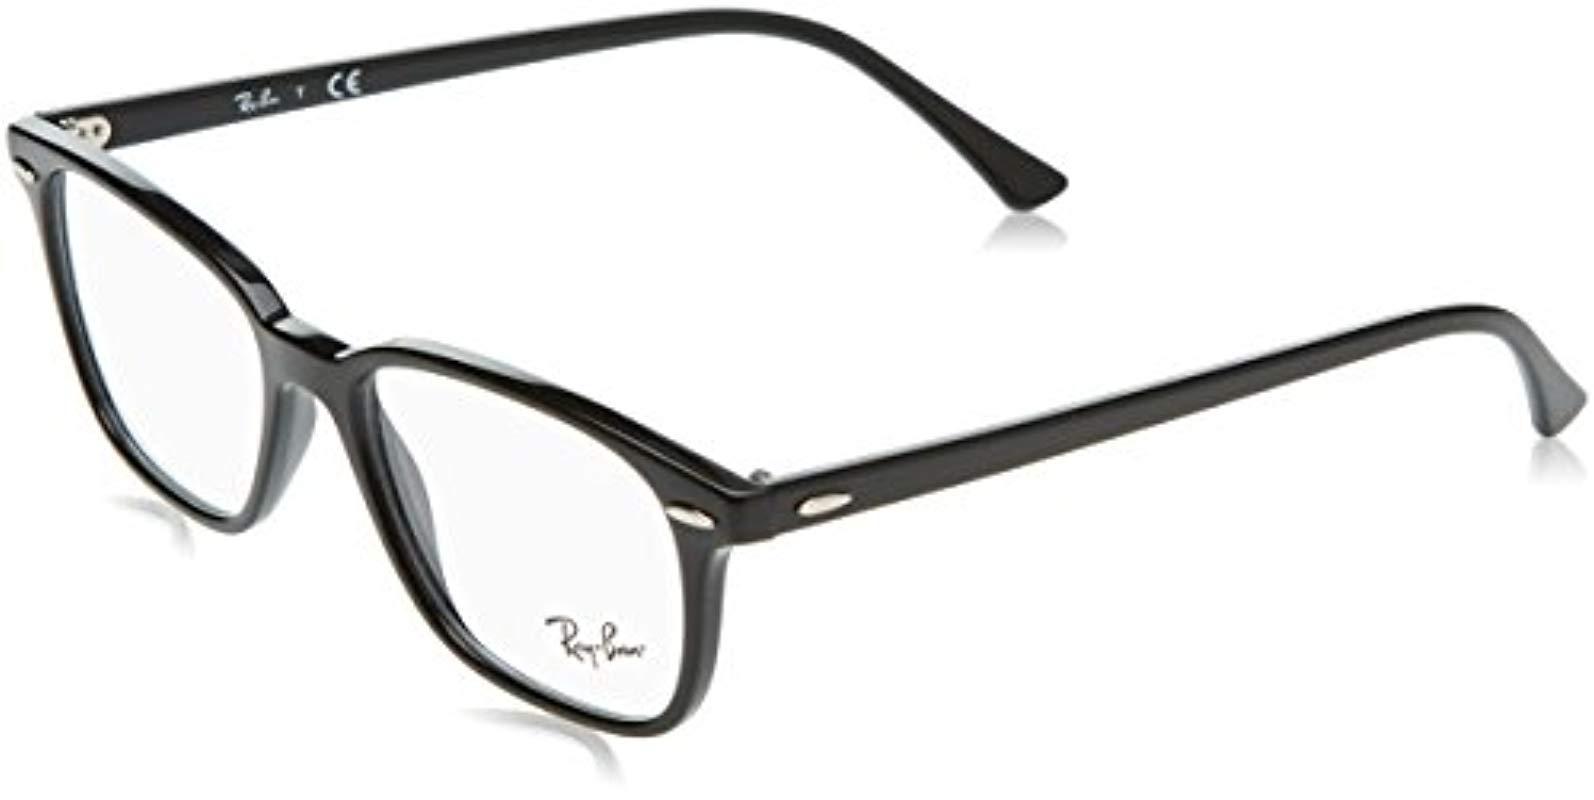 19f042d1b4 Ray-Ban Rx7119 Glasses In Black Rx7119 2000 53 in Black - Lyst